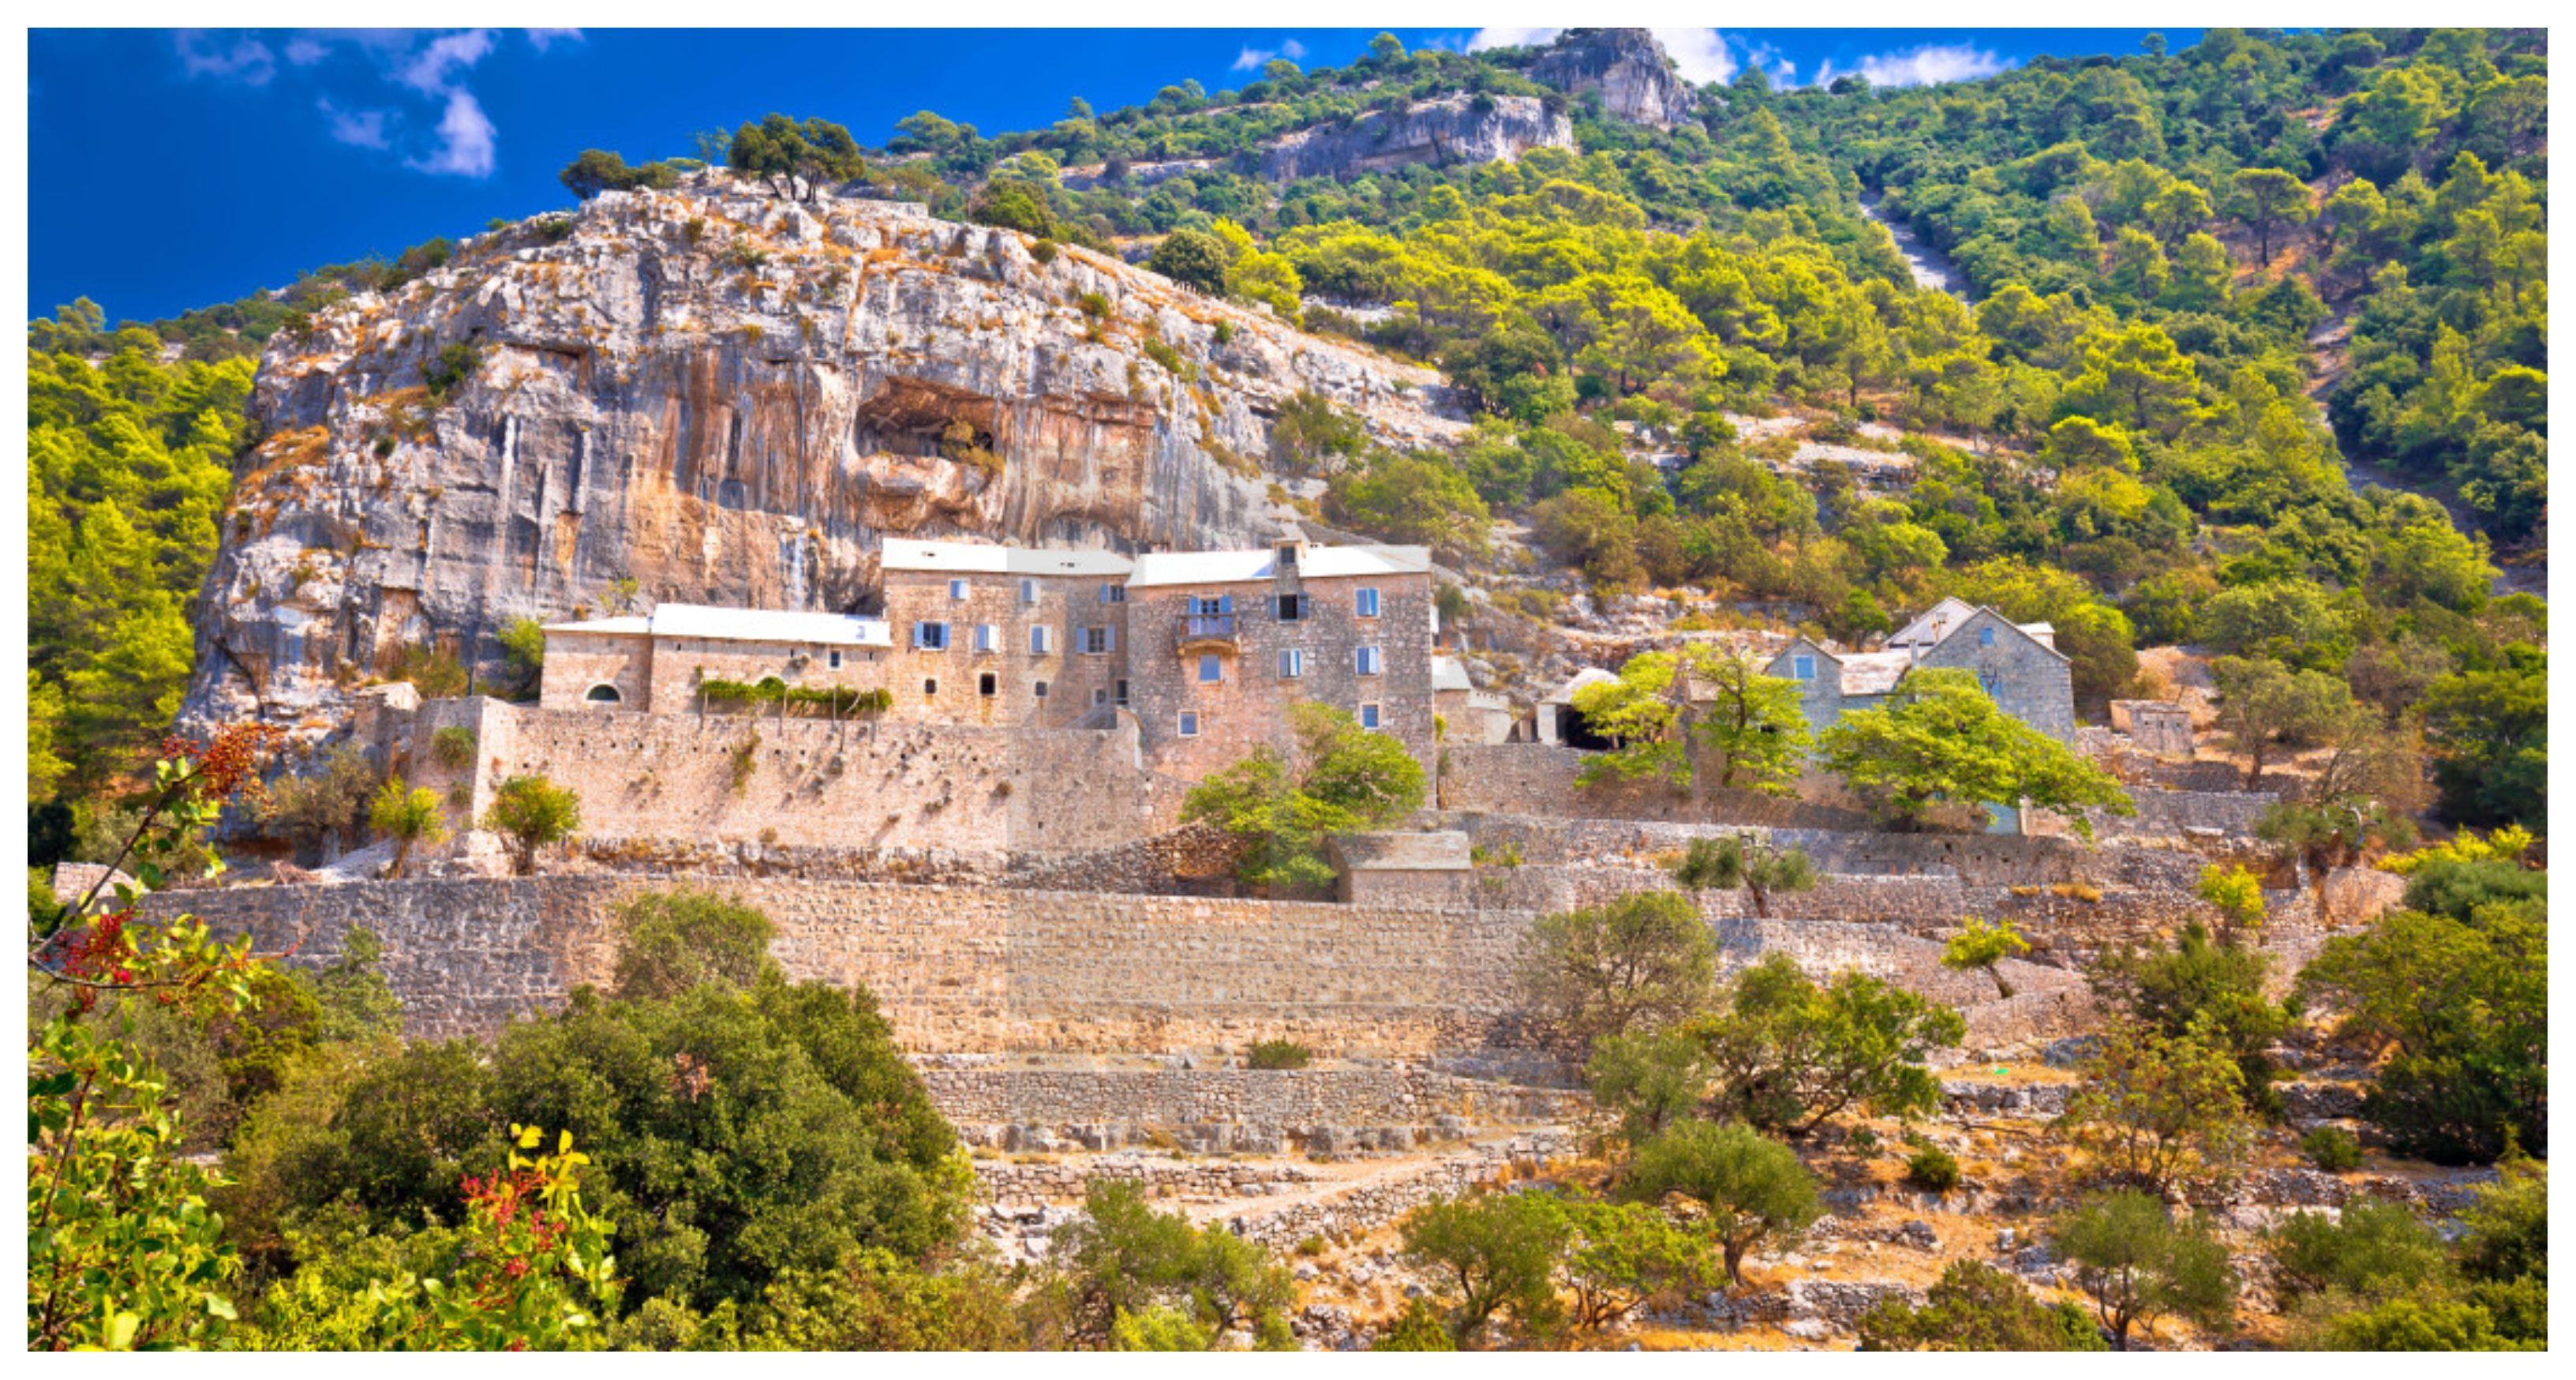 Blaca Monastery - Brac Island